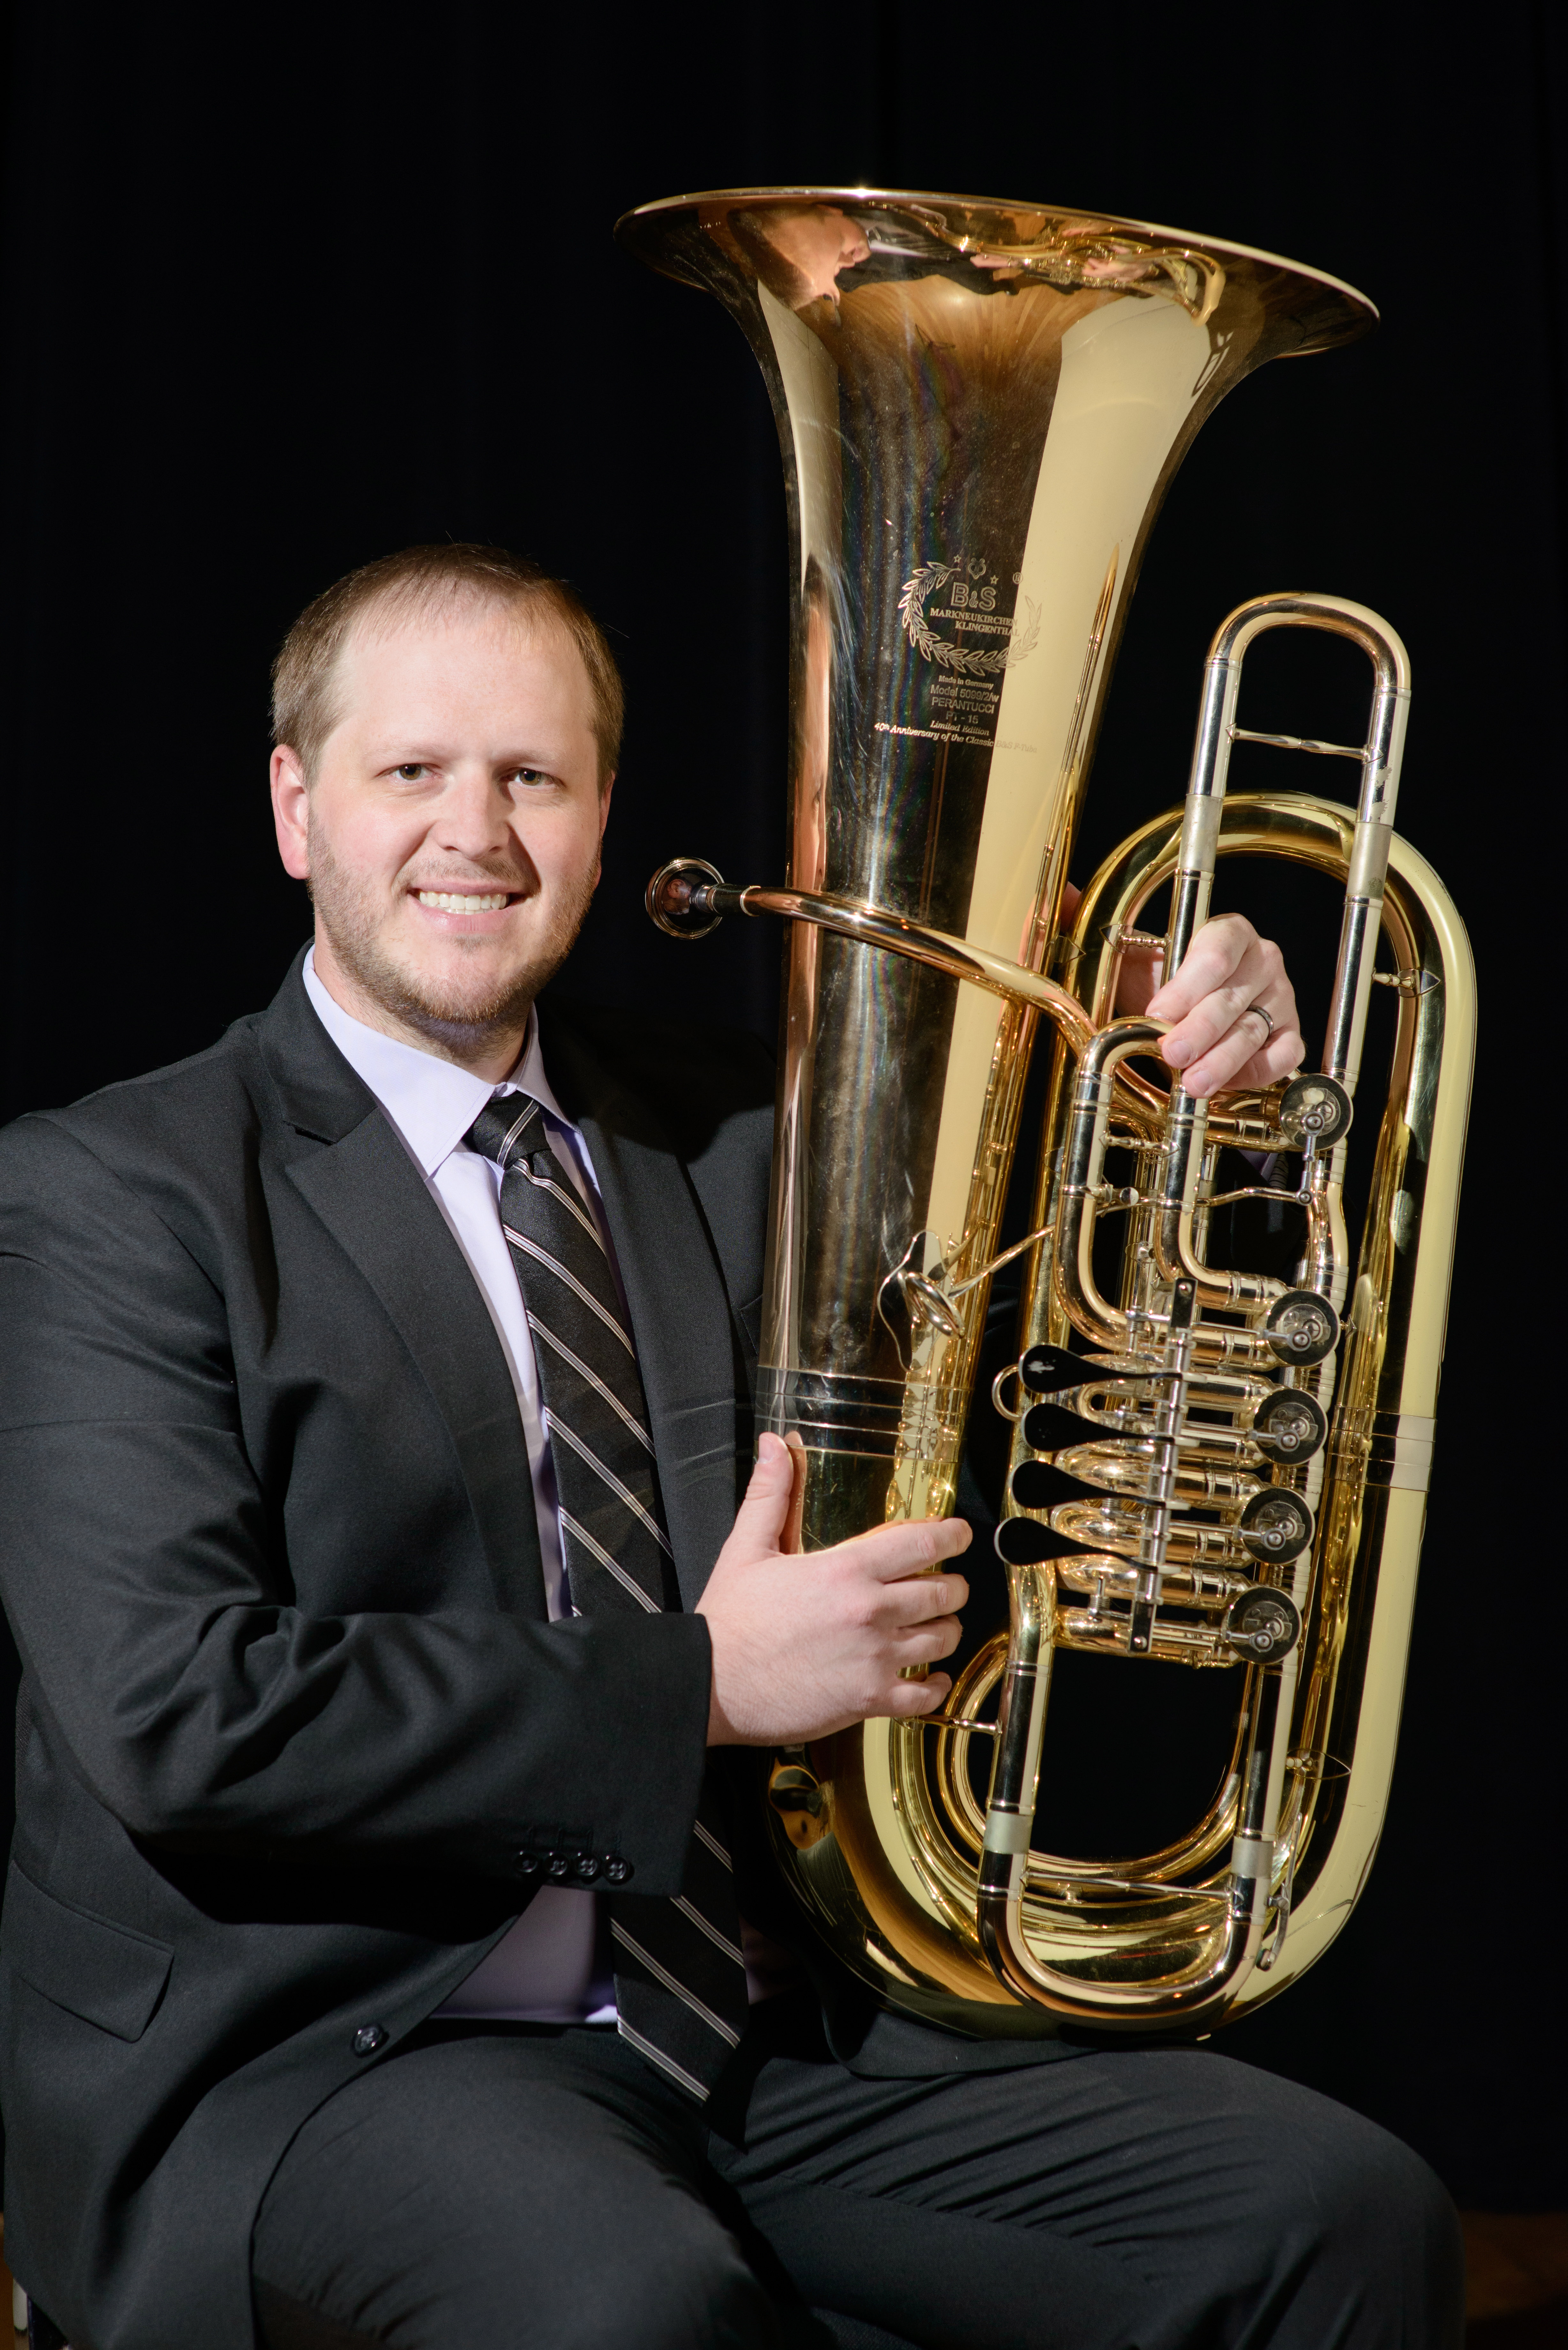 Daniel Rowland, tuba